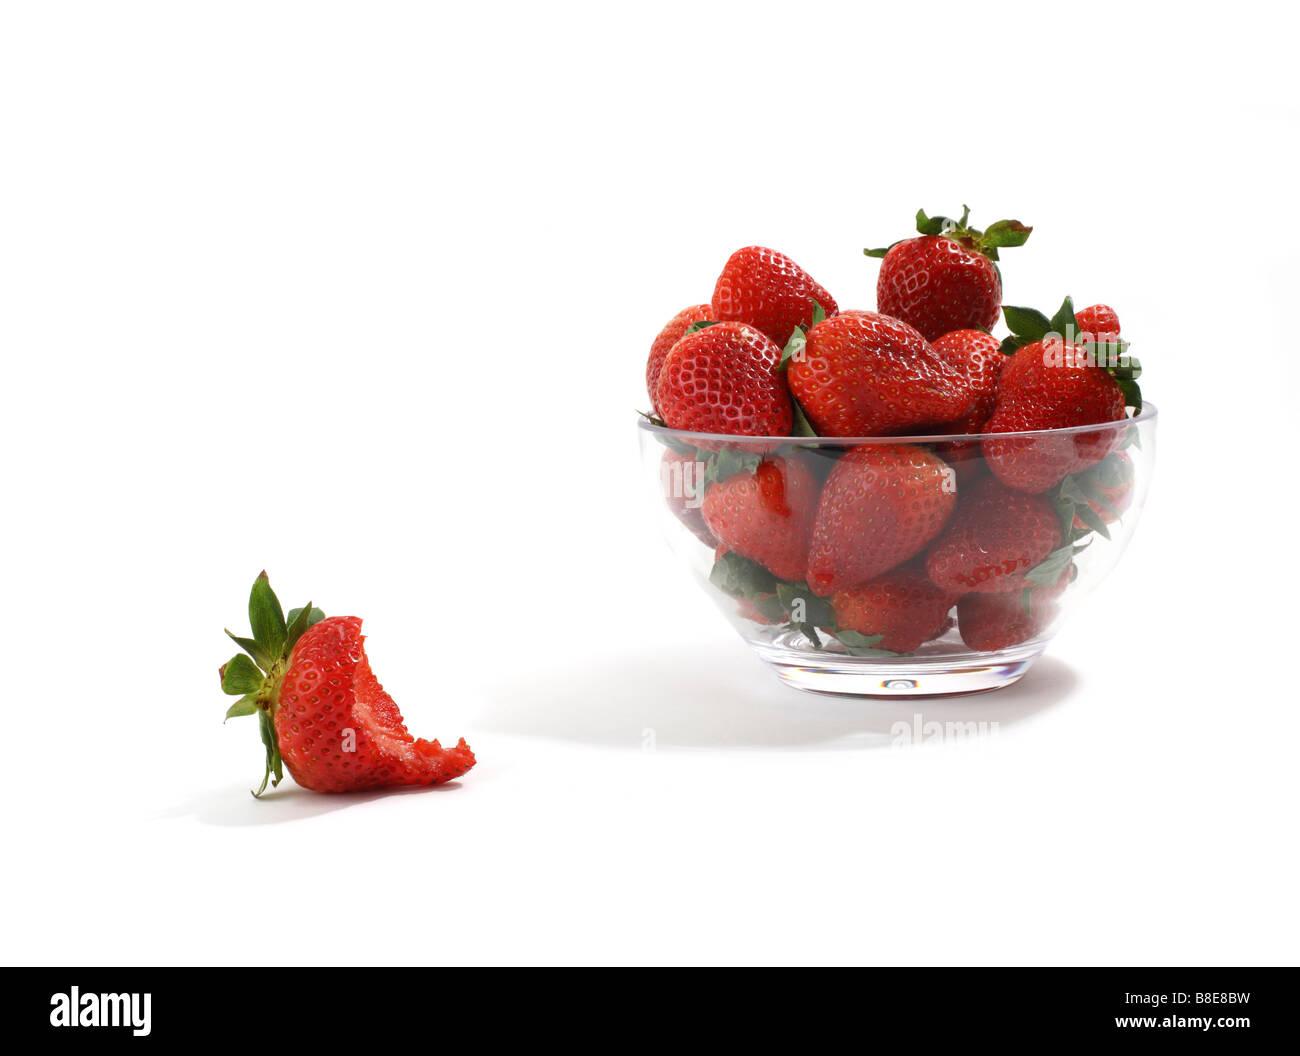 Tazón de fresas rojas con uno come en primer plano Imagen De Stock